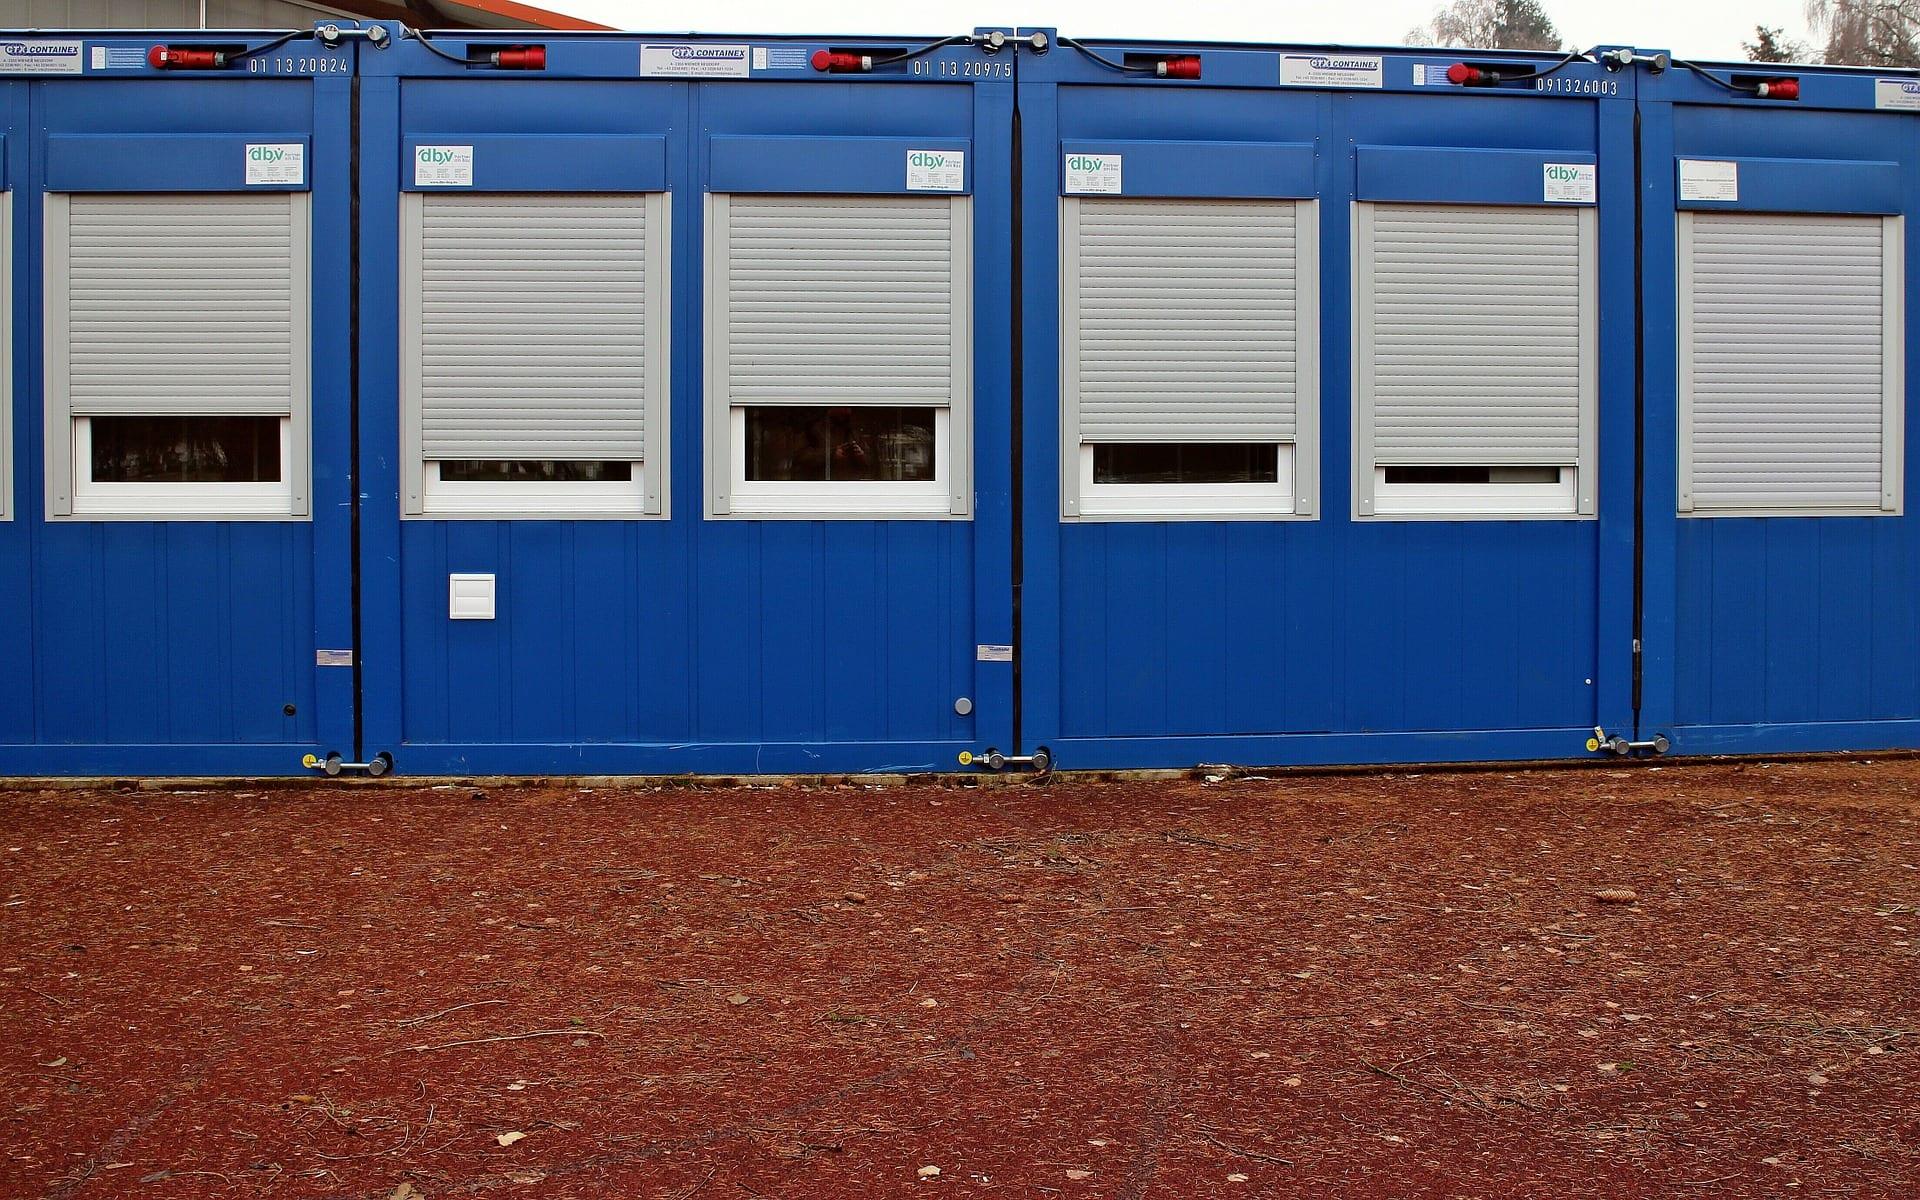 Baucontainerreinigung 1